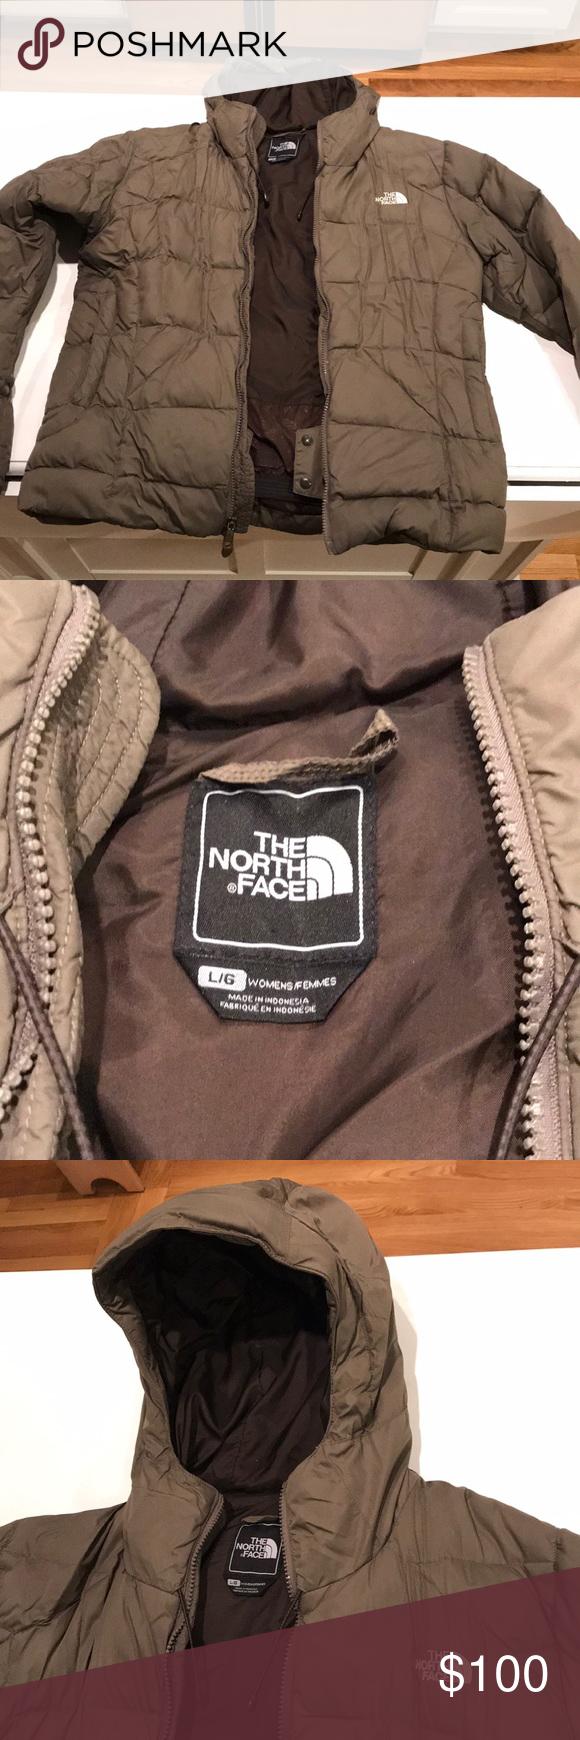 North Face Jacket Brown Tan North Face Jacket Jackets Clothes Design [ 1740 x 580 Pixel ]